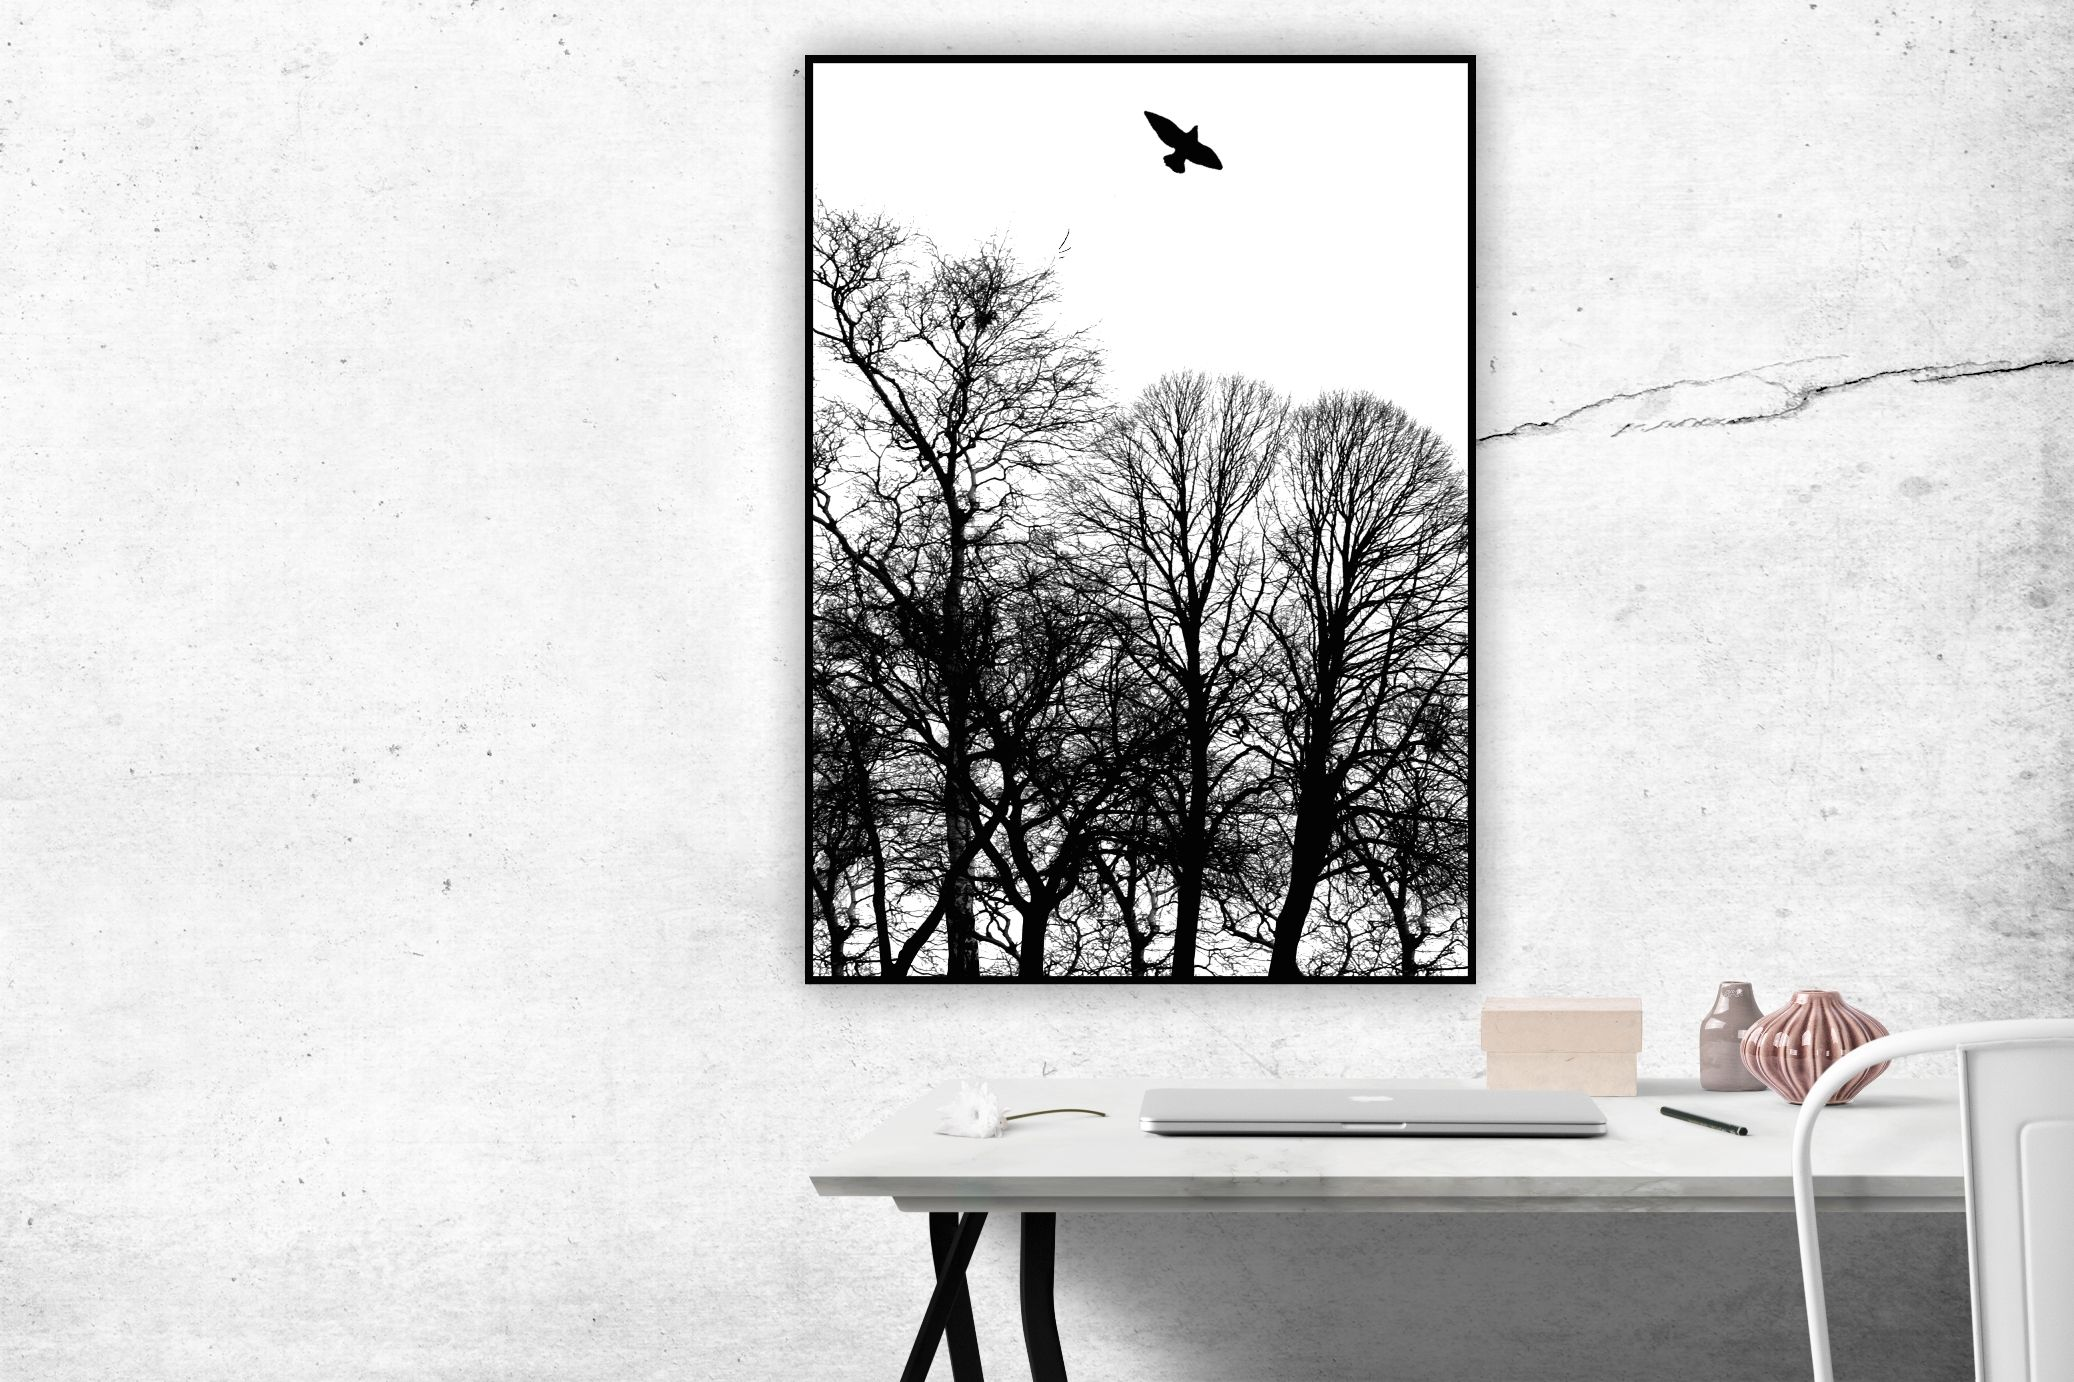 Poster vögel baum skandihome skandinavischer stil wandgestaltung